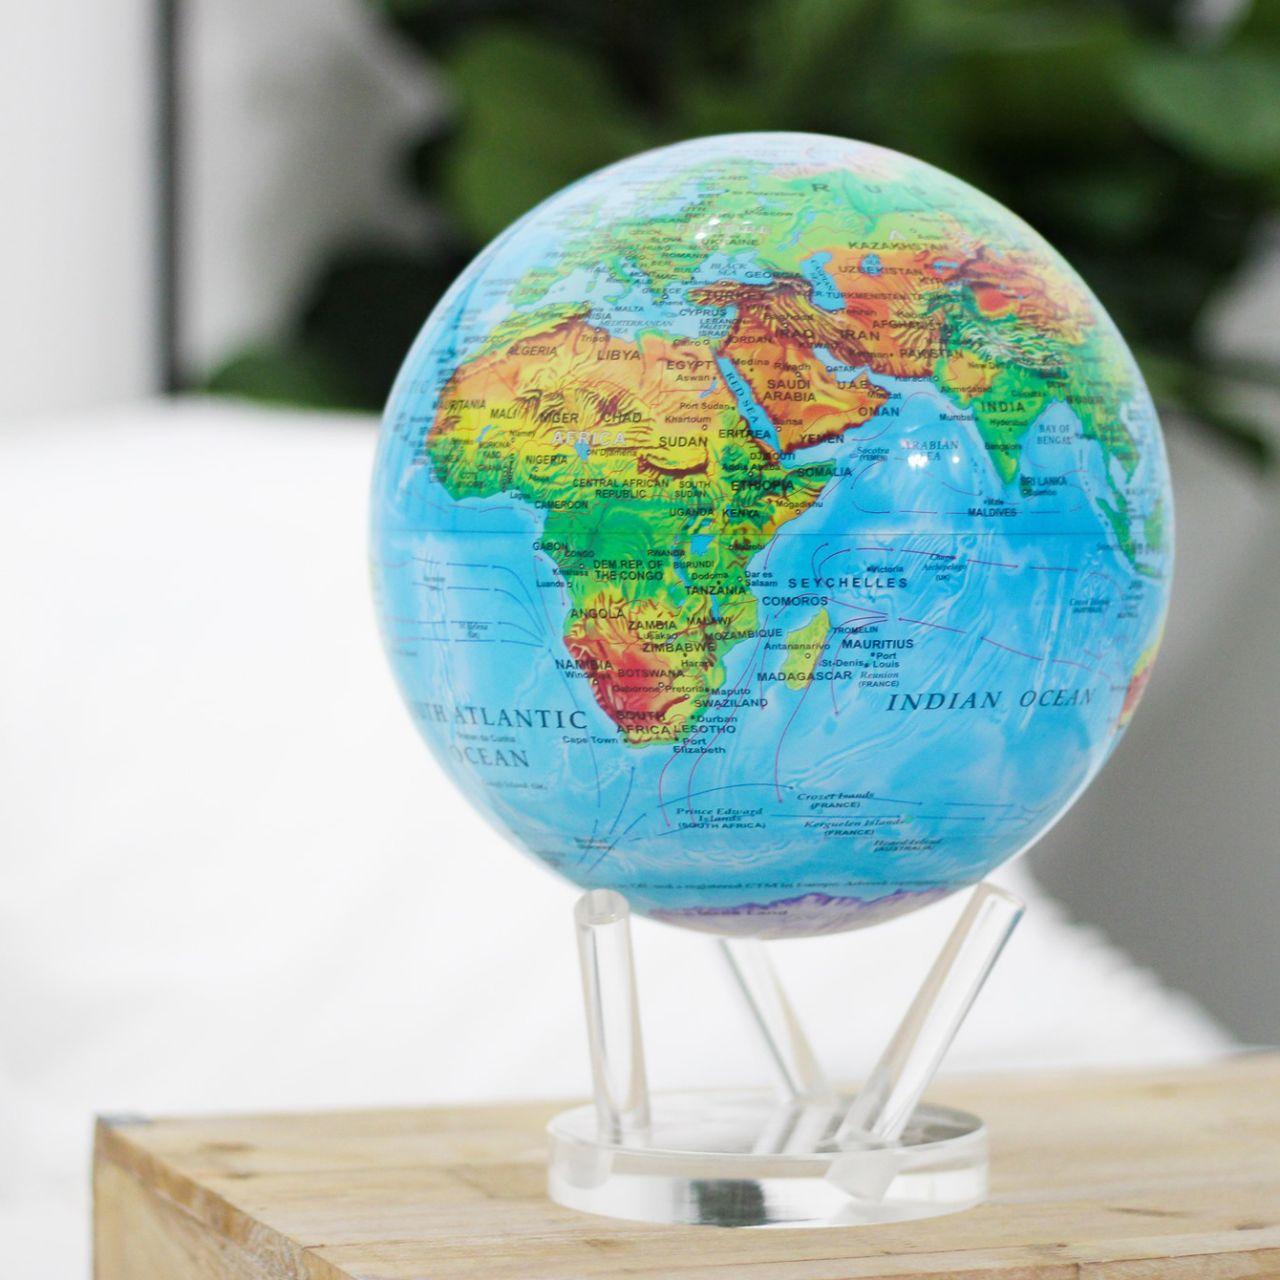 globe terrestre reliefs et océans mova